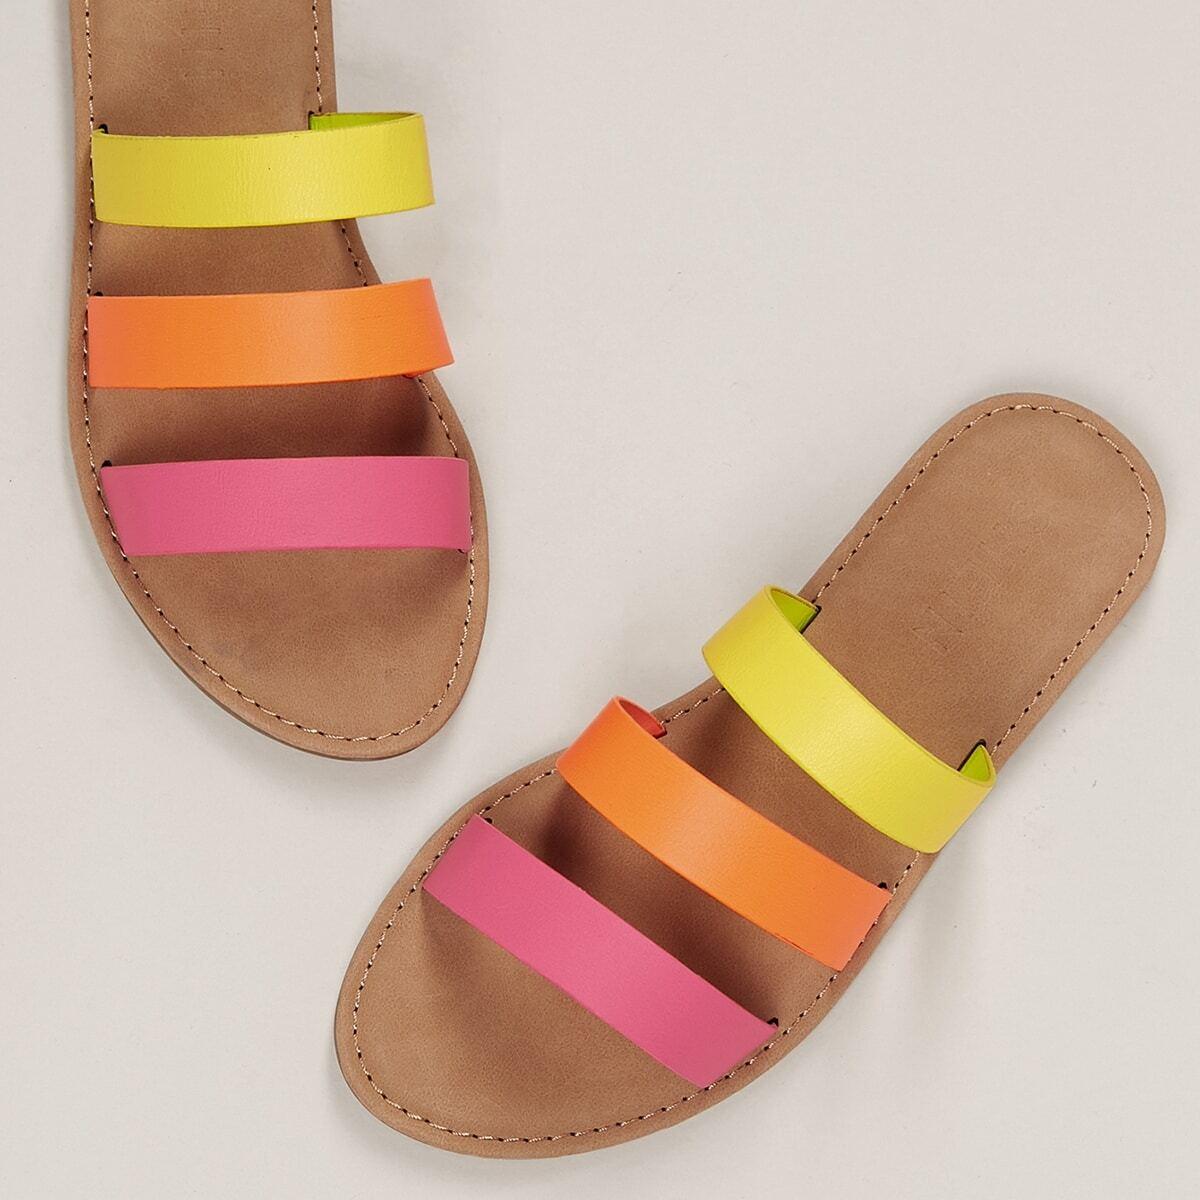 Неоновые сандалии на плоской подошве от SHEIN